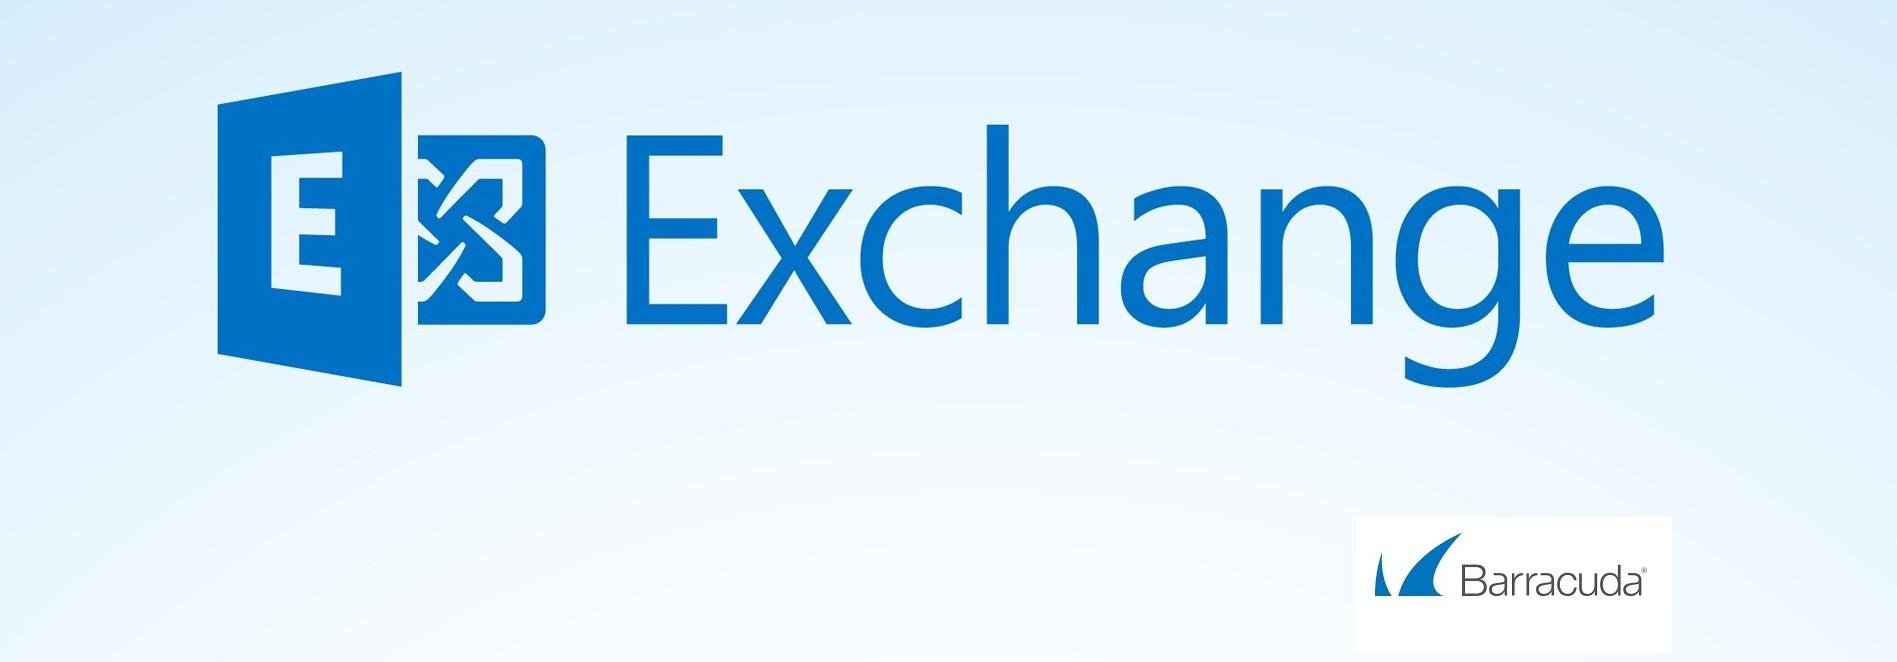 Attacco a Microsoft Exchange, un'analisi di Barracuda